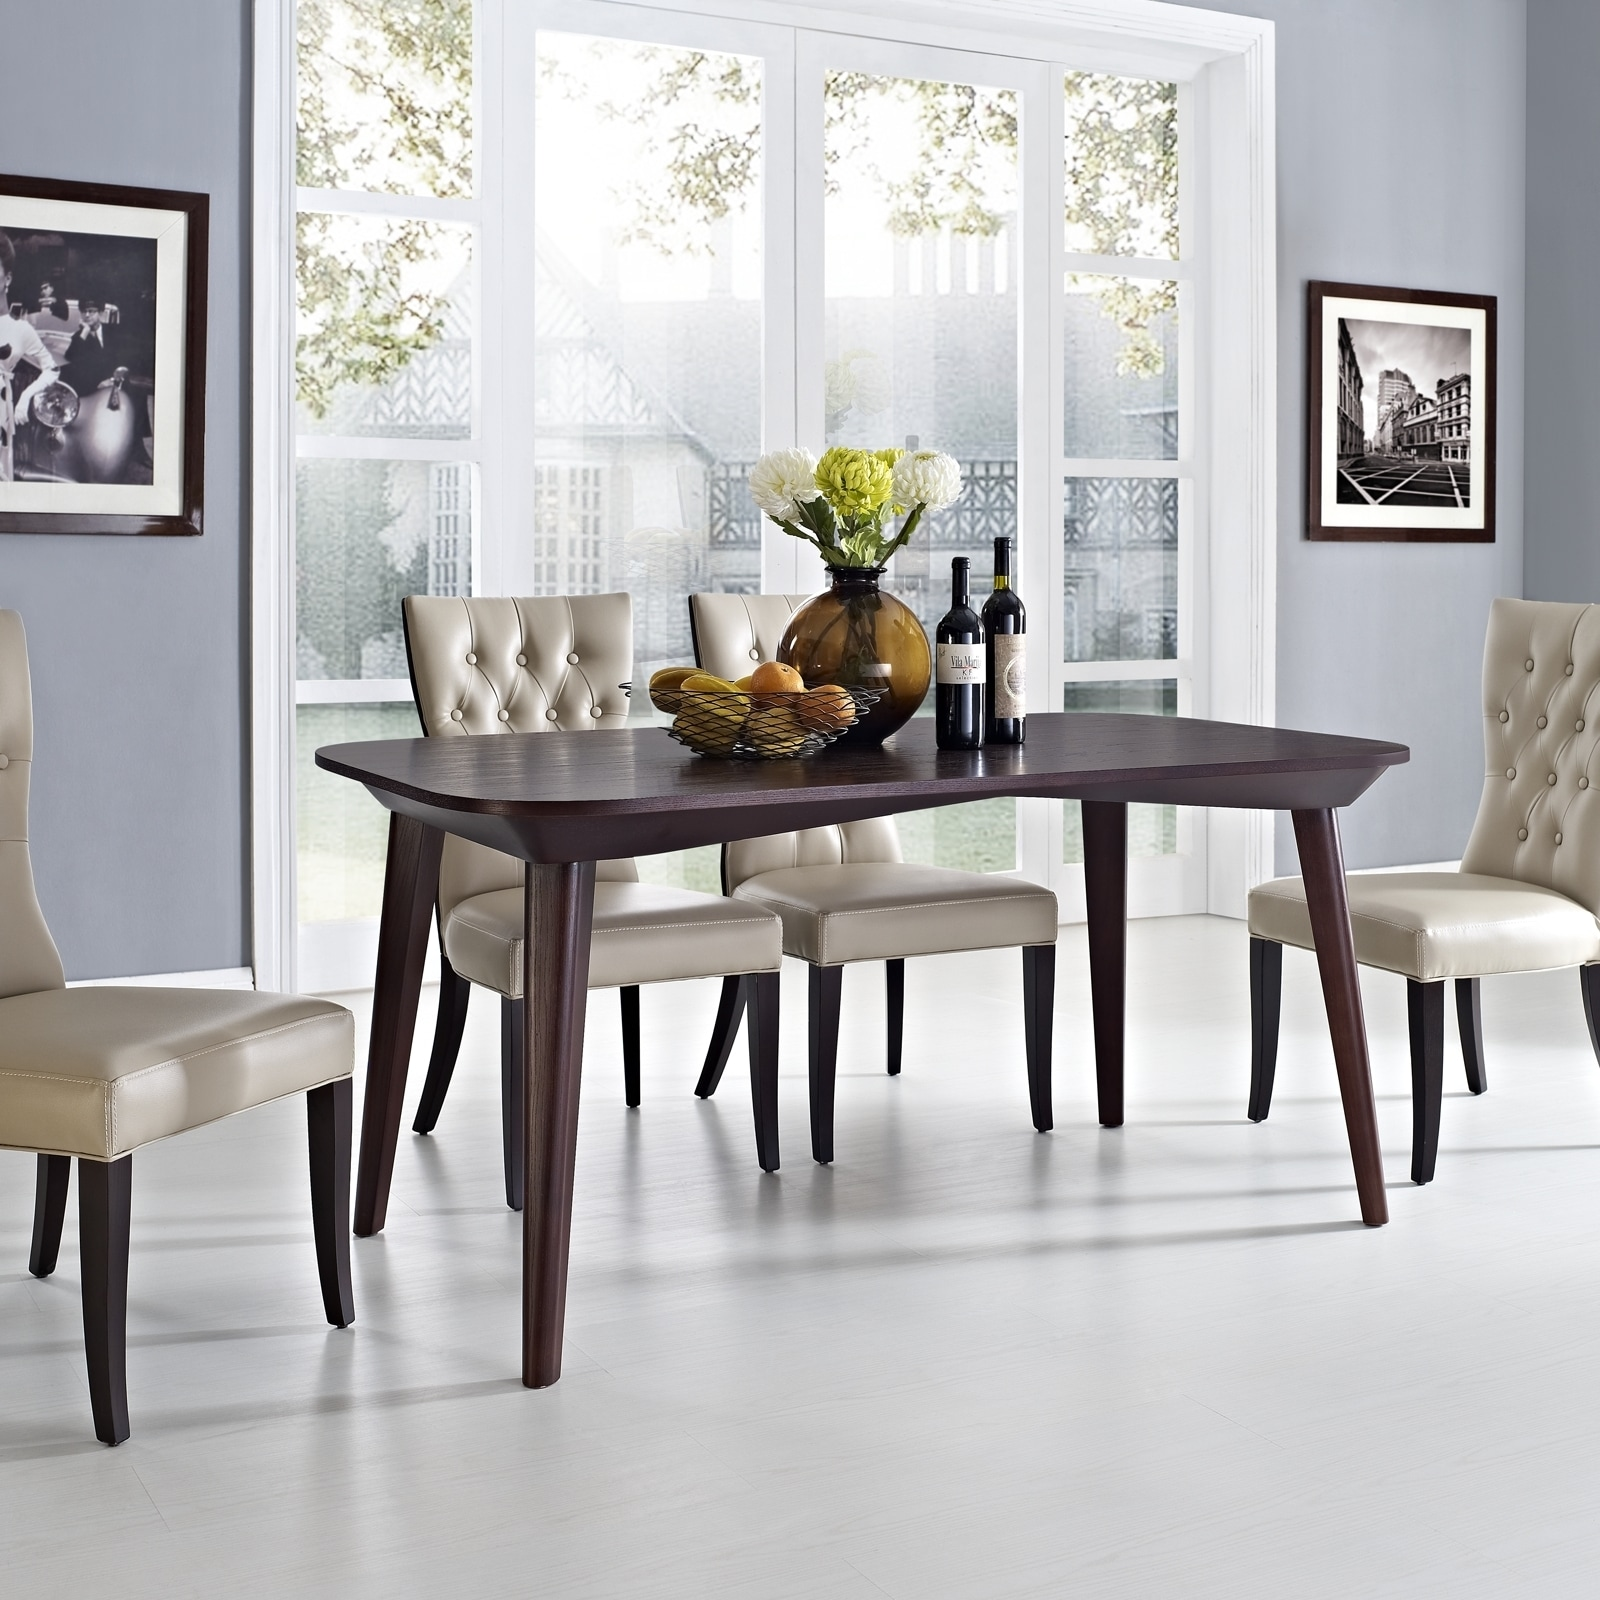 Enterprise walnut wood dining table